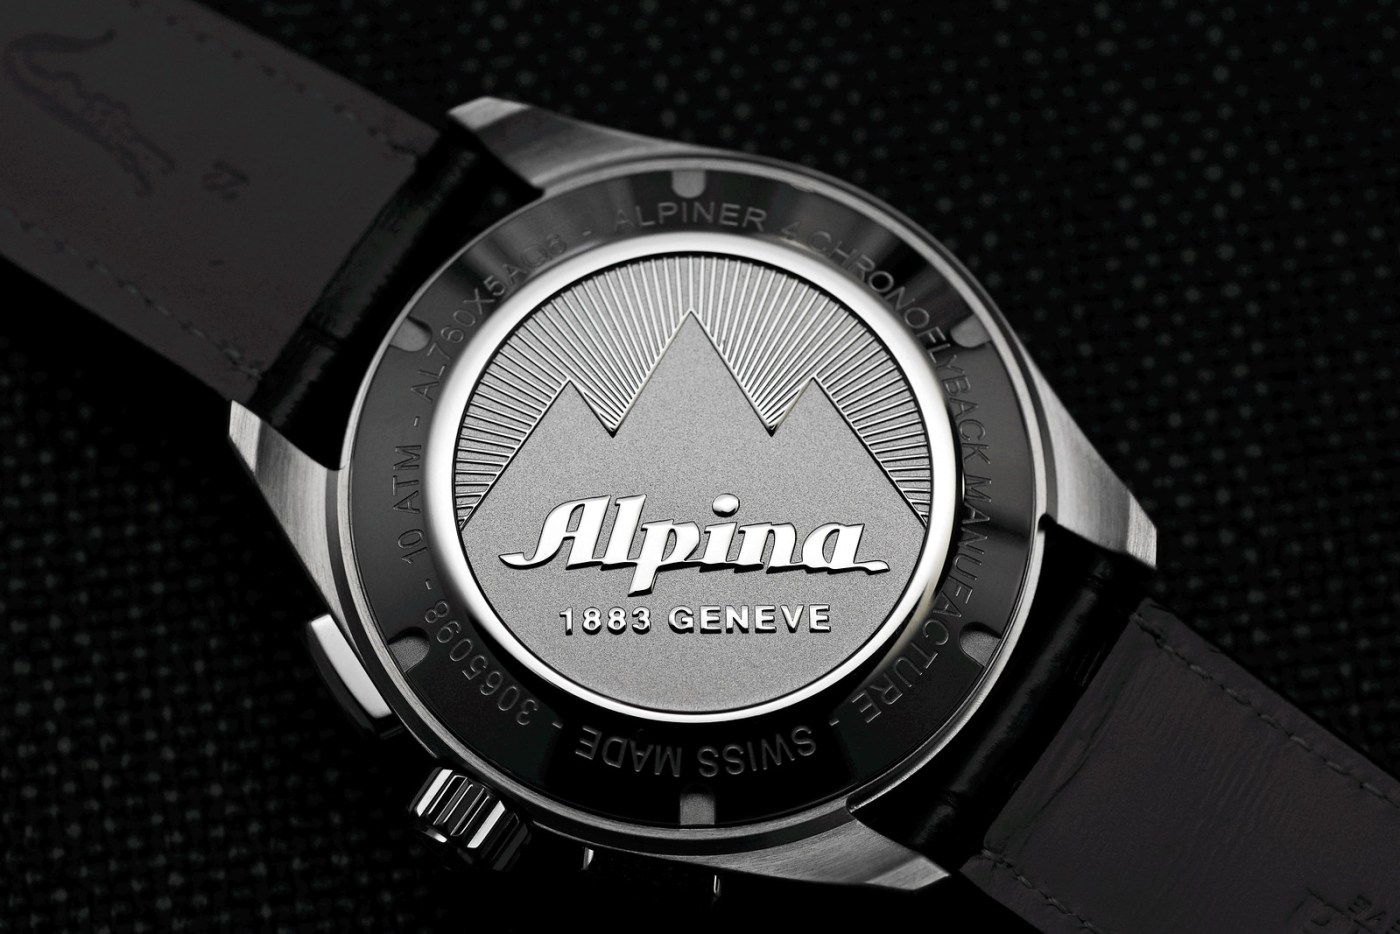 Alpina Alpiner 4 Chronoflyback caseback